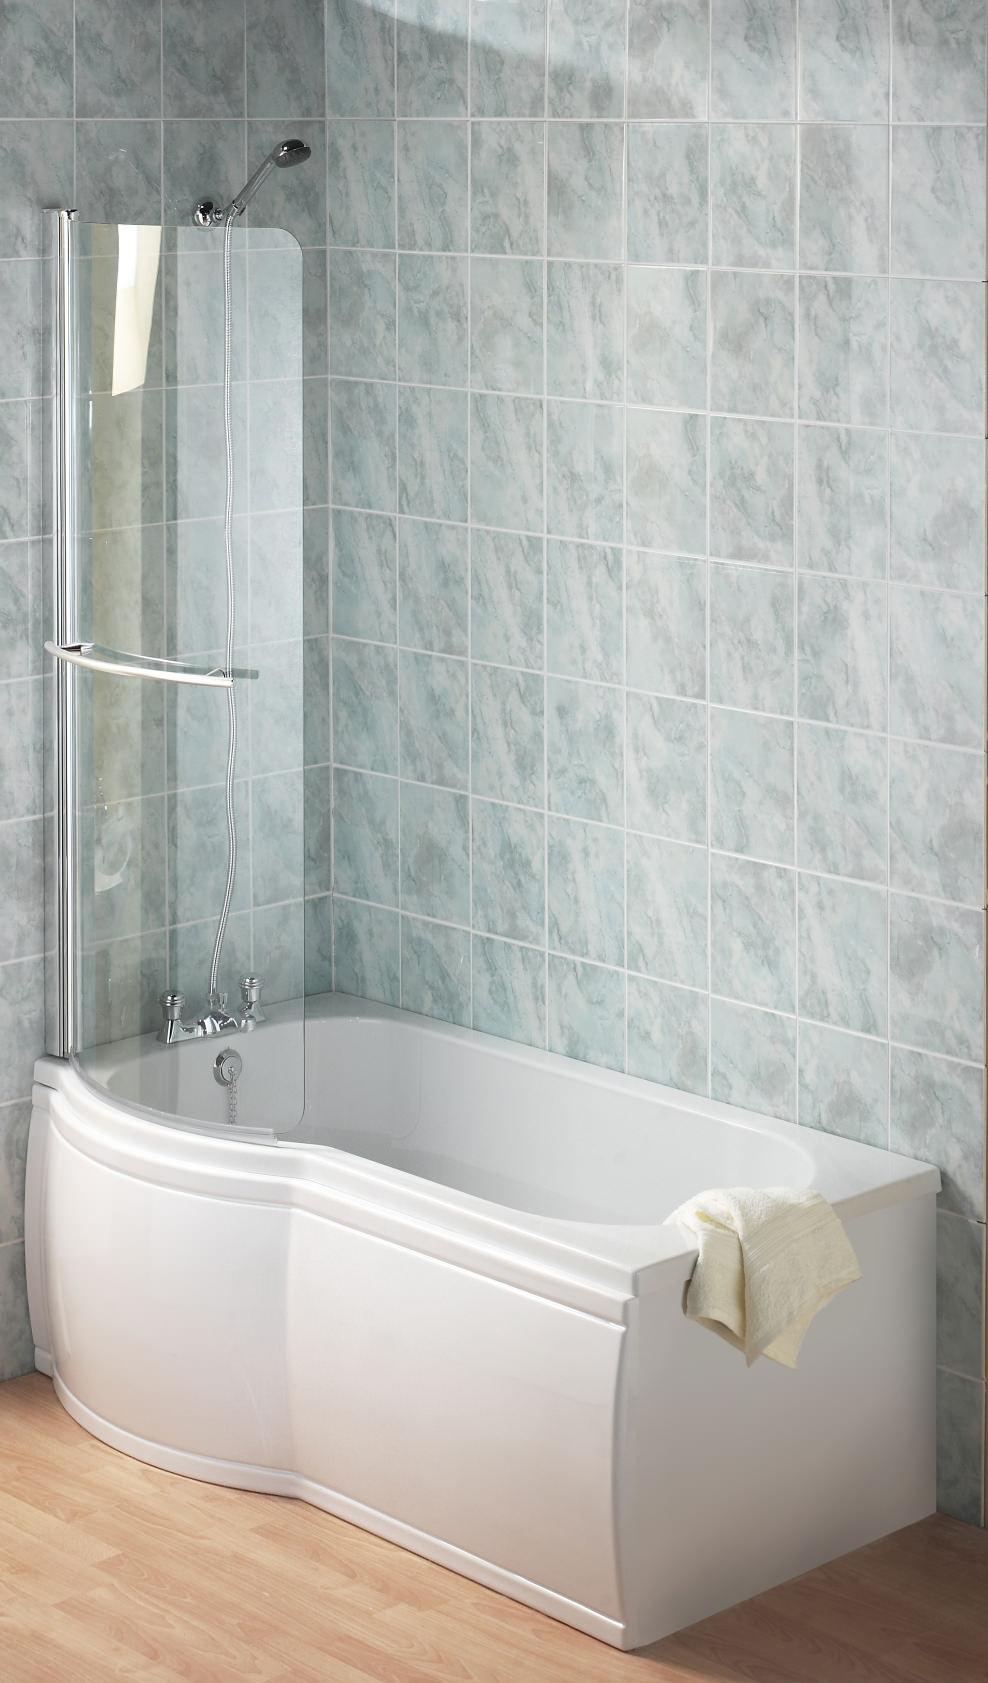 twyford galerie optimise left hand offset shower bath 1700mm twyford galerie optimise left hand offset shower bath 1700 x 750 850mm